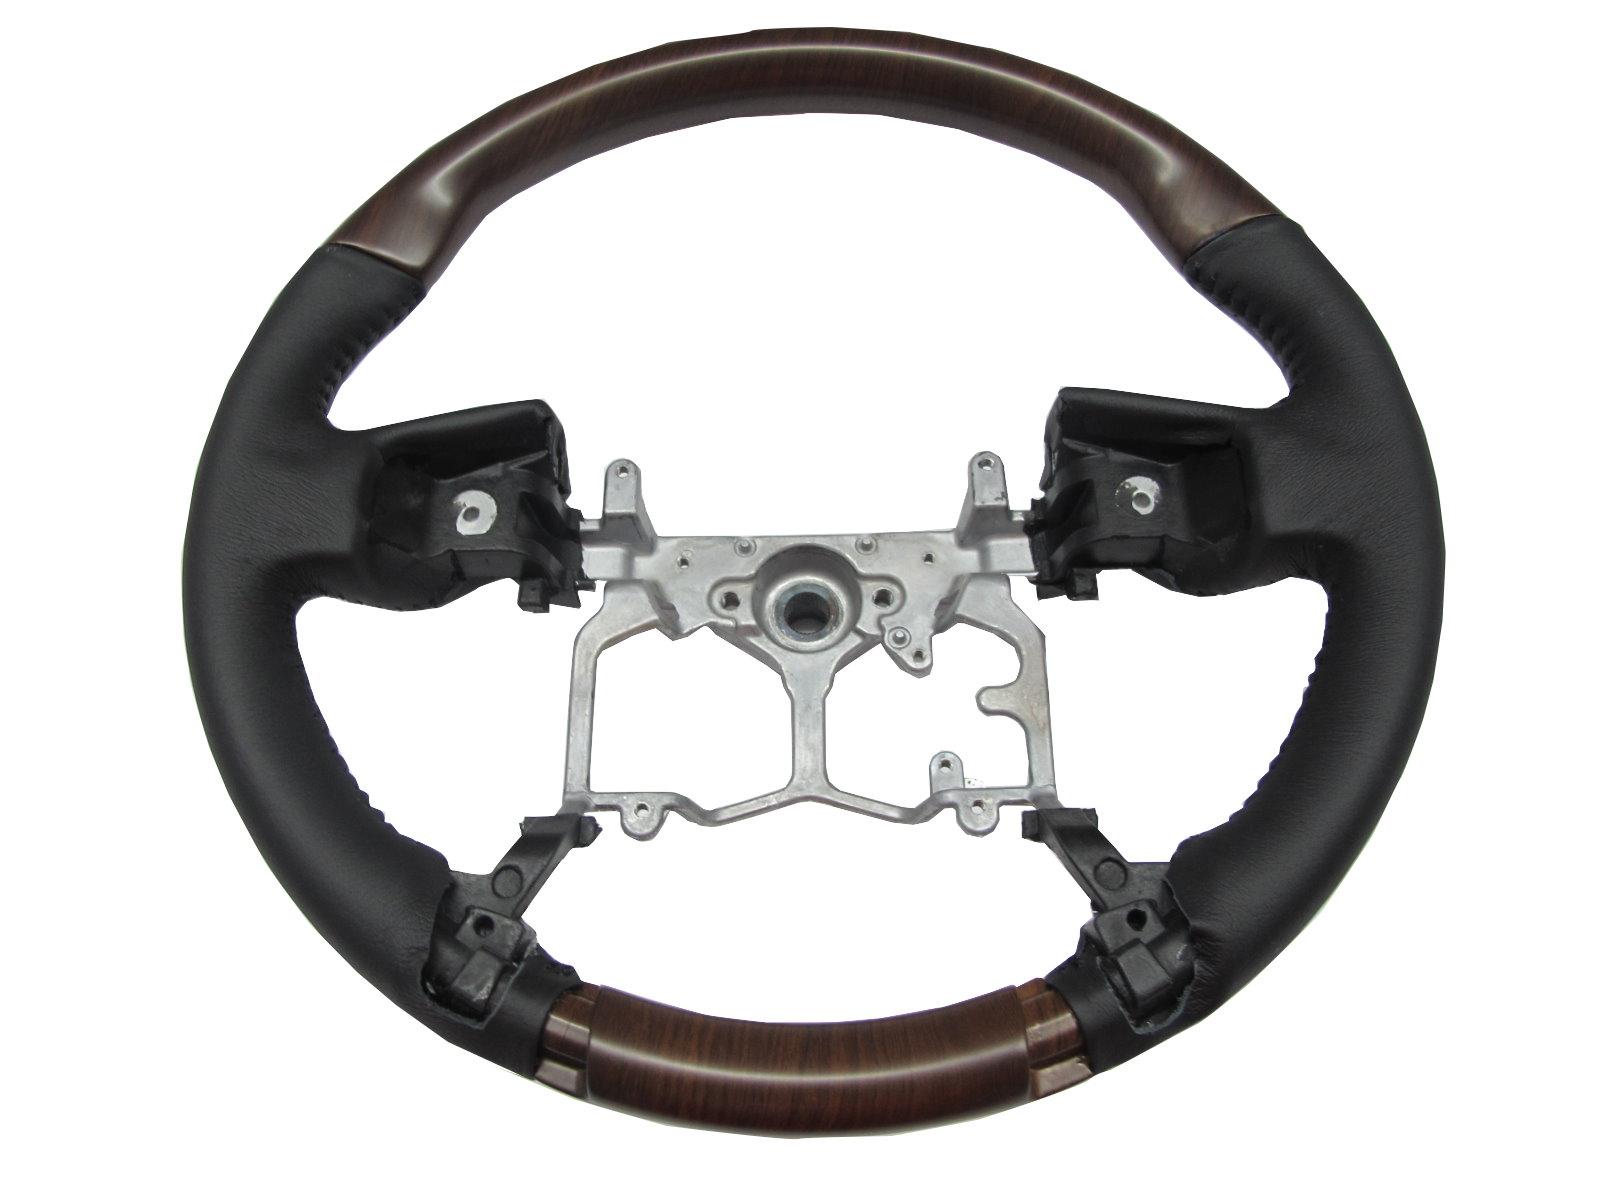 gx460 2009 2014 steering wheel oe walnut wood black for. Black Bedroom Furniture Sets. Home Design Ideas